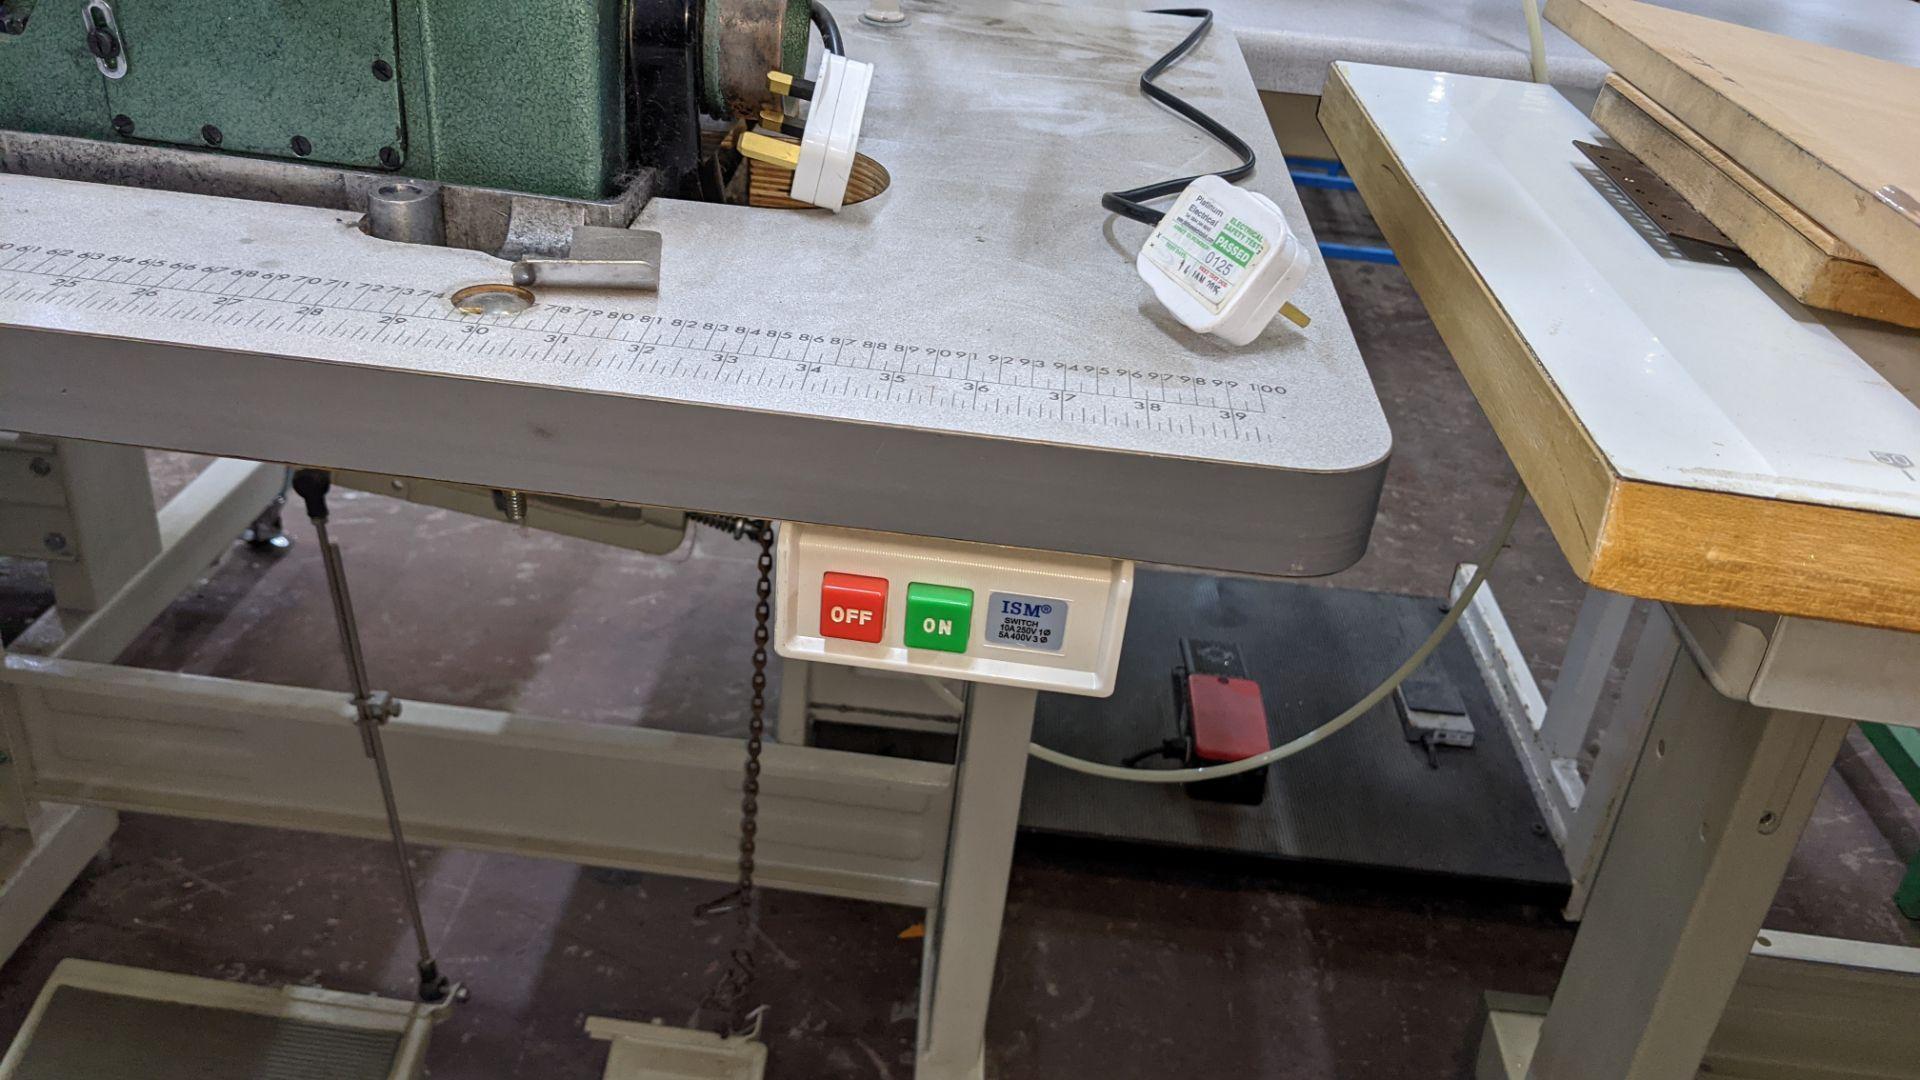 Sewing machine - Image 12 of 16